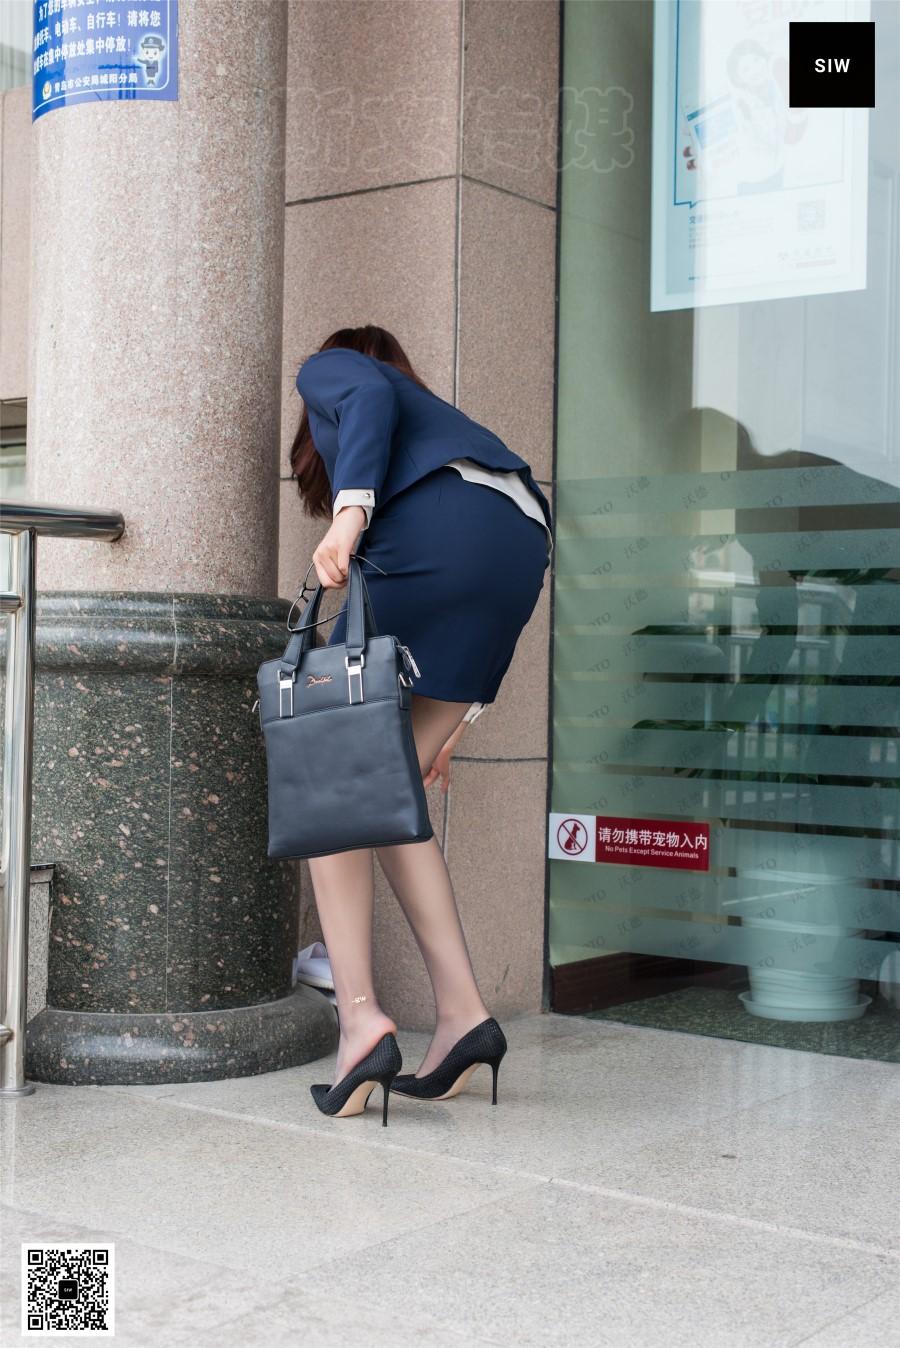 [SIW斯文传媒]VOL.079 银行职员-嘉慧